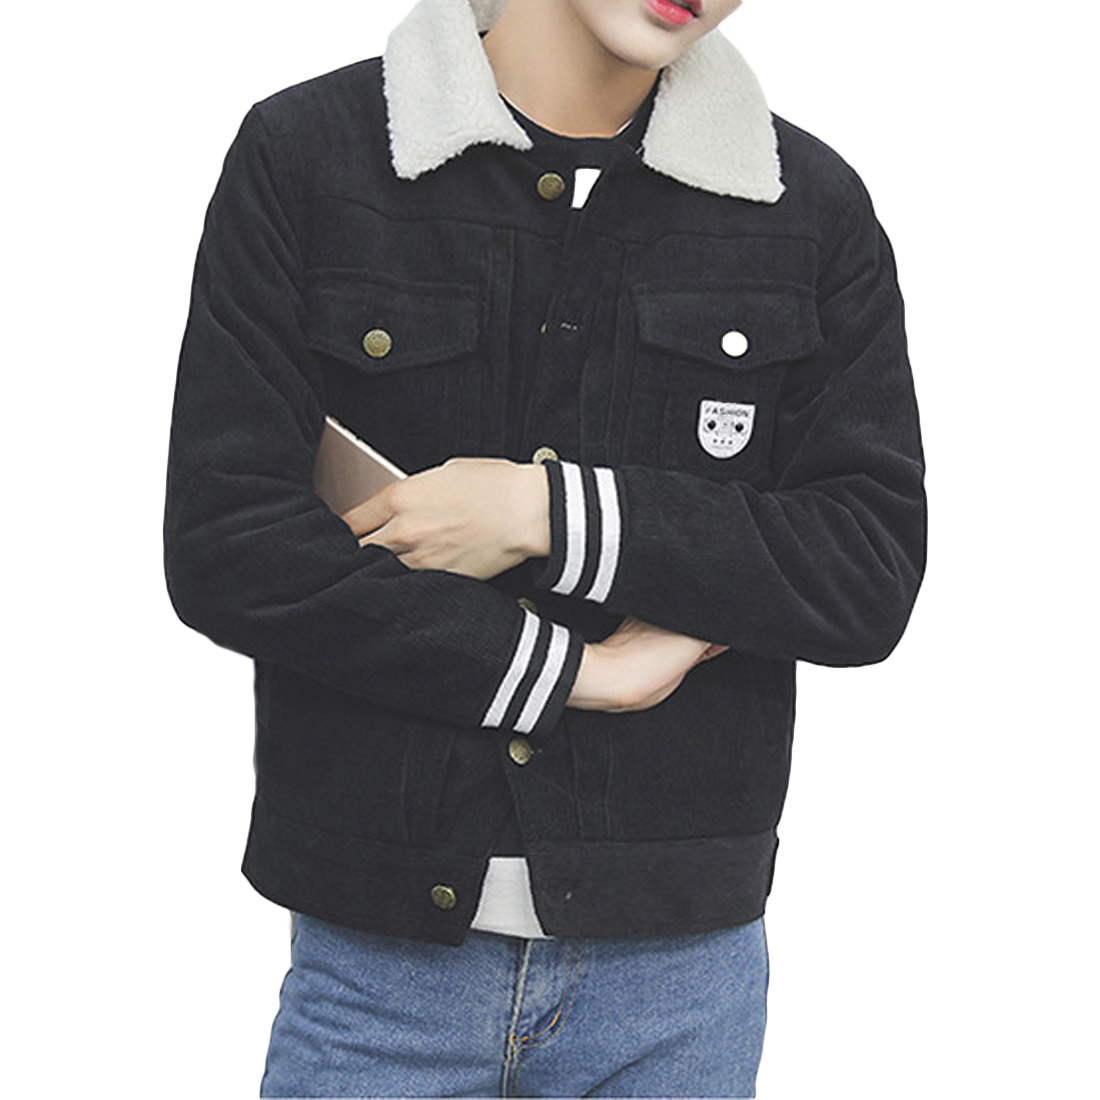 2017 Hot Corduroy Cotton Coats Men Long Sleeve Patchwork Gray Black Jackets Mens Slim Fleece Overcoats Youth Bodyfriend ClothingОдежда и ак�е��уары<br><br><br>Aliexpress